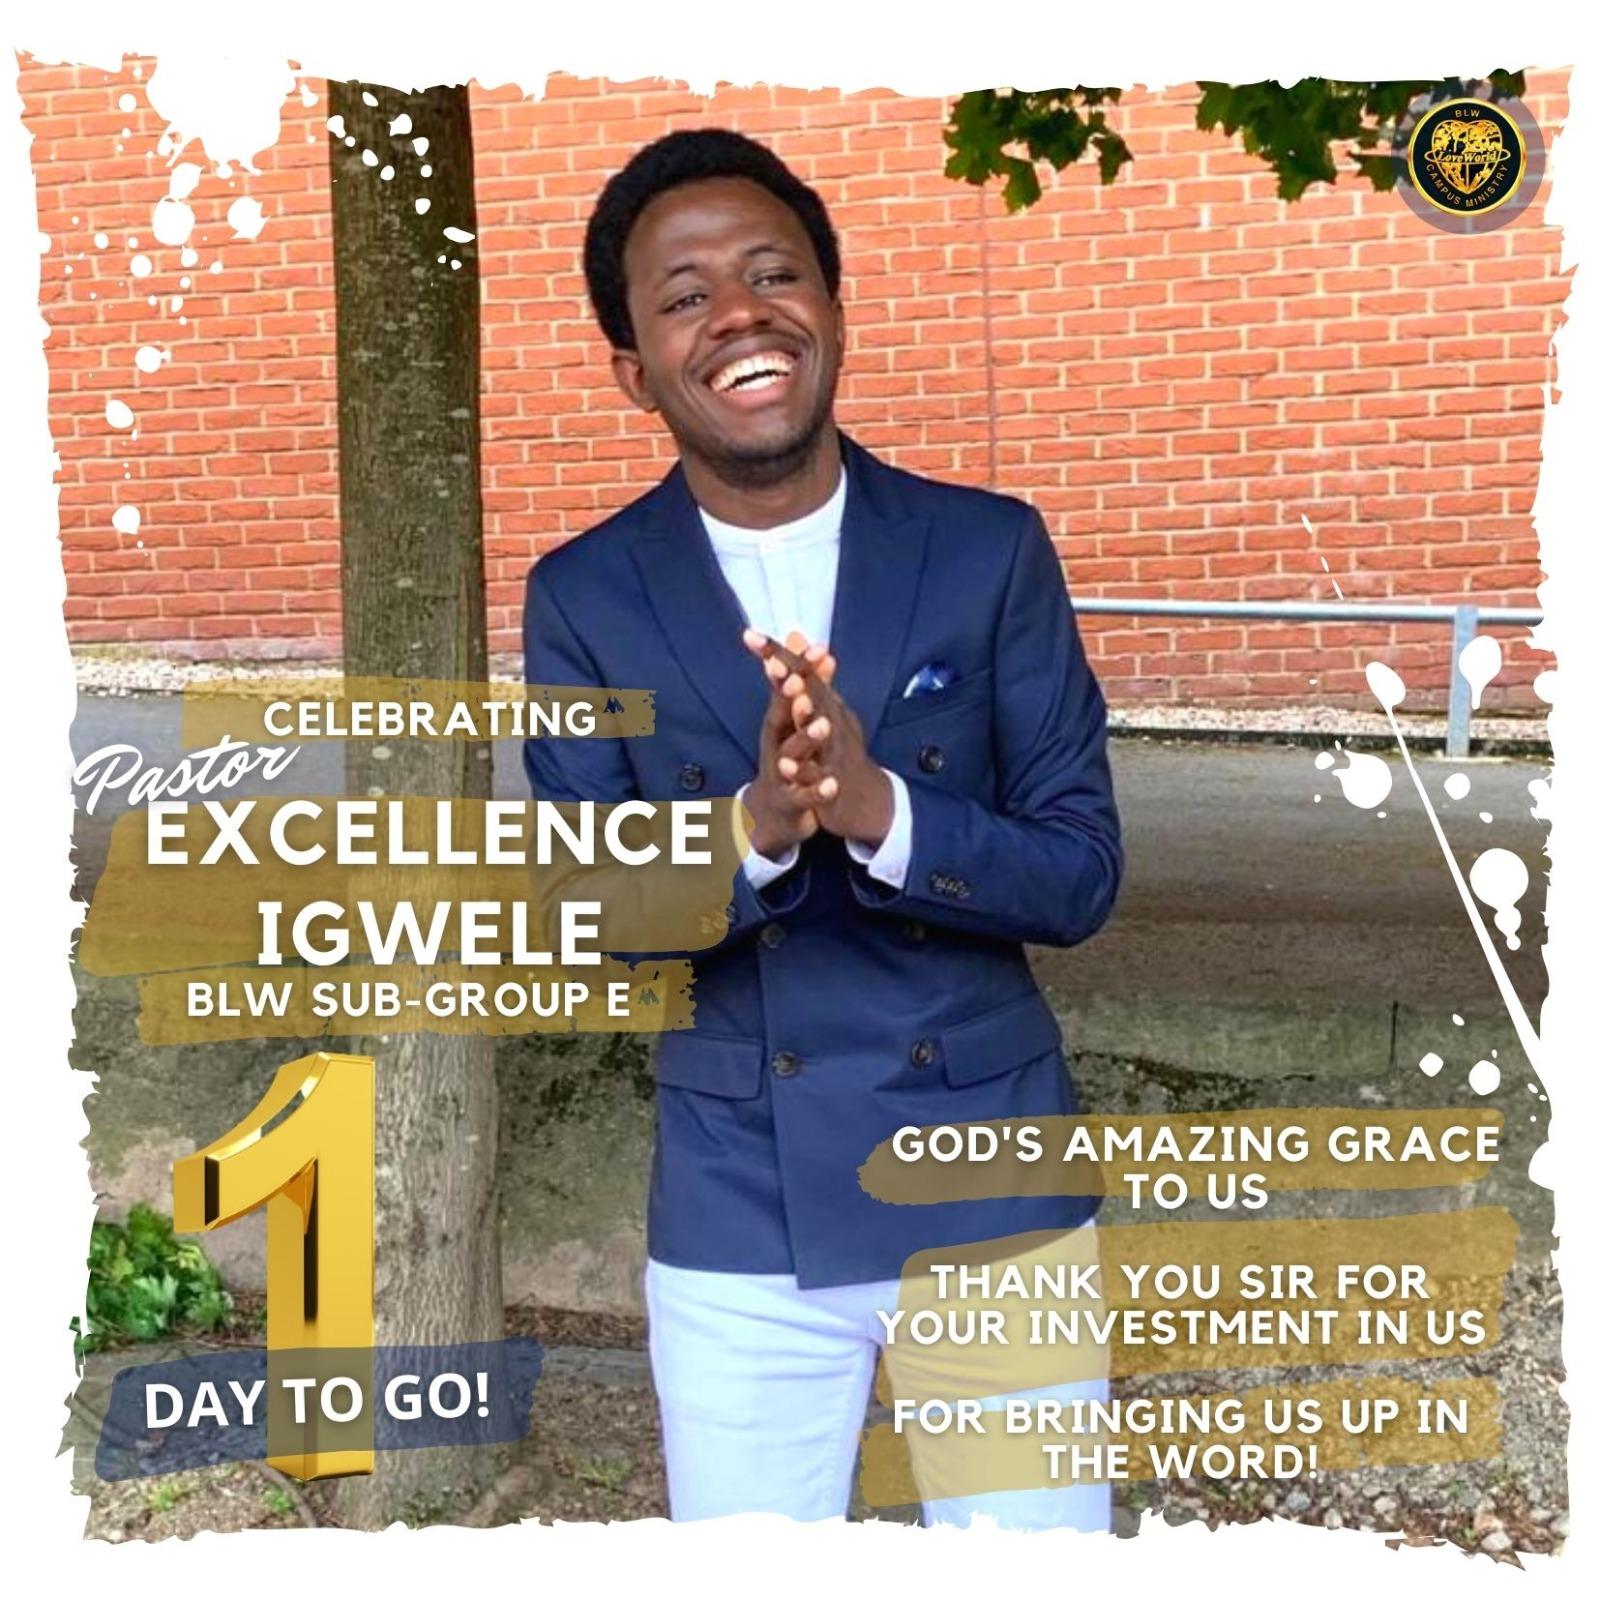 Glory!!! #7daysofdeepcelebration #celebratingGreat